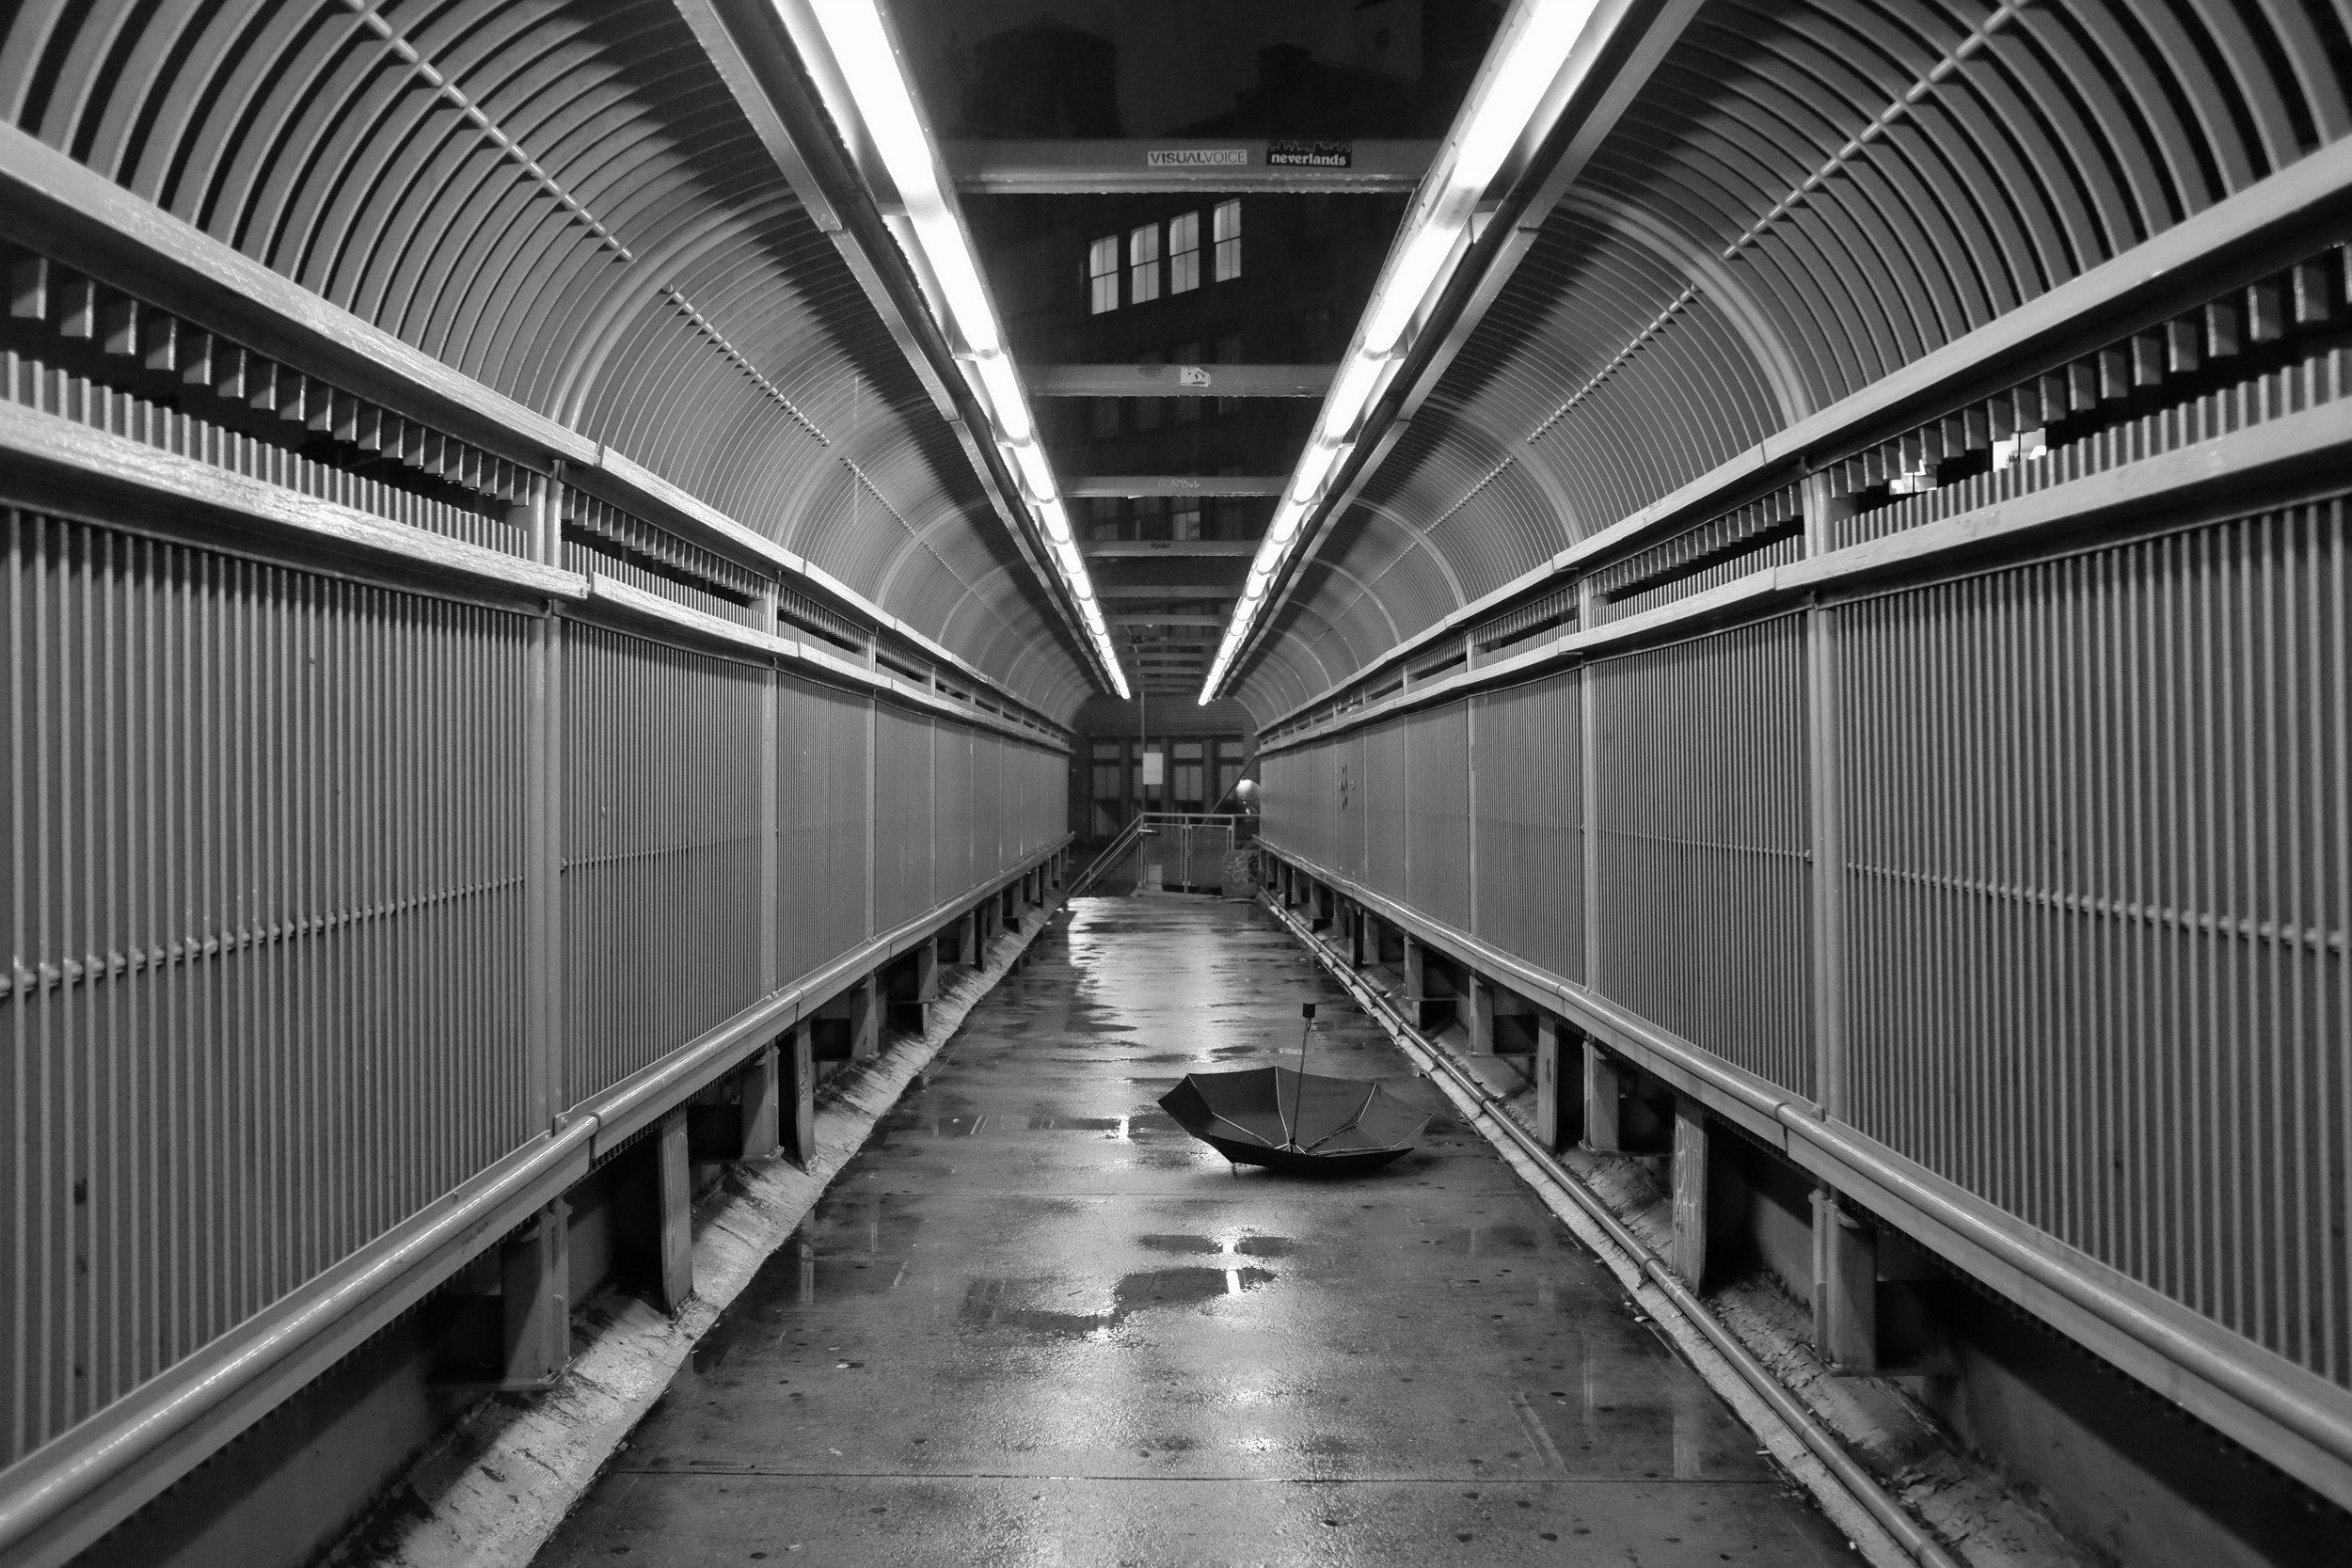 Laight Street Footbridge. TriBeCa. New York City. 2016.